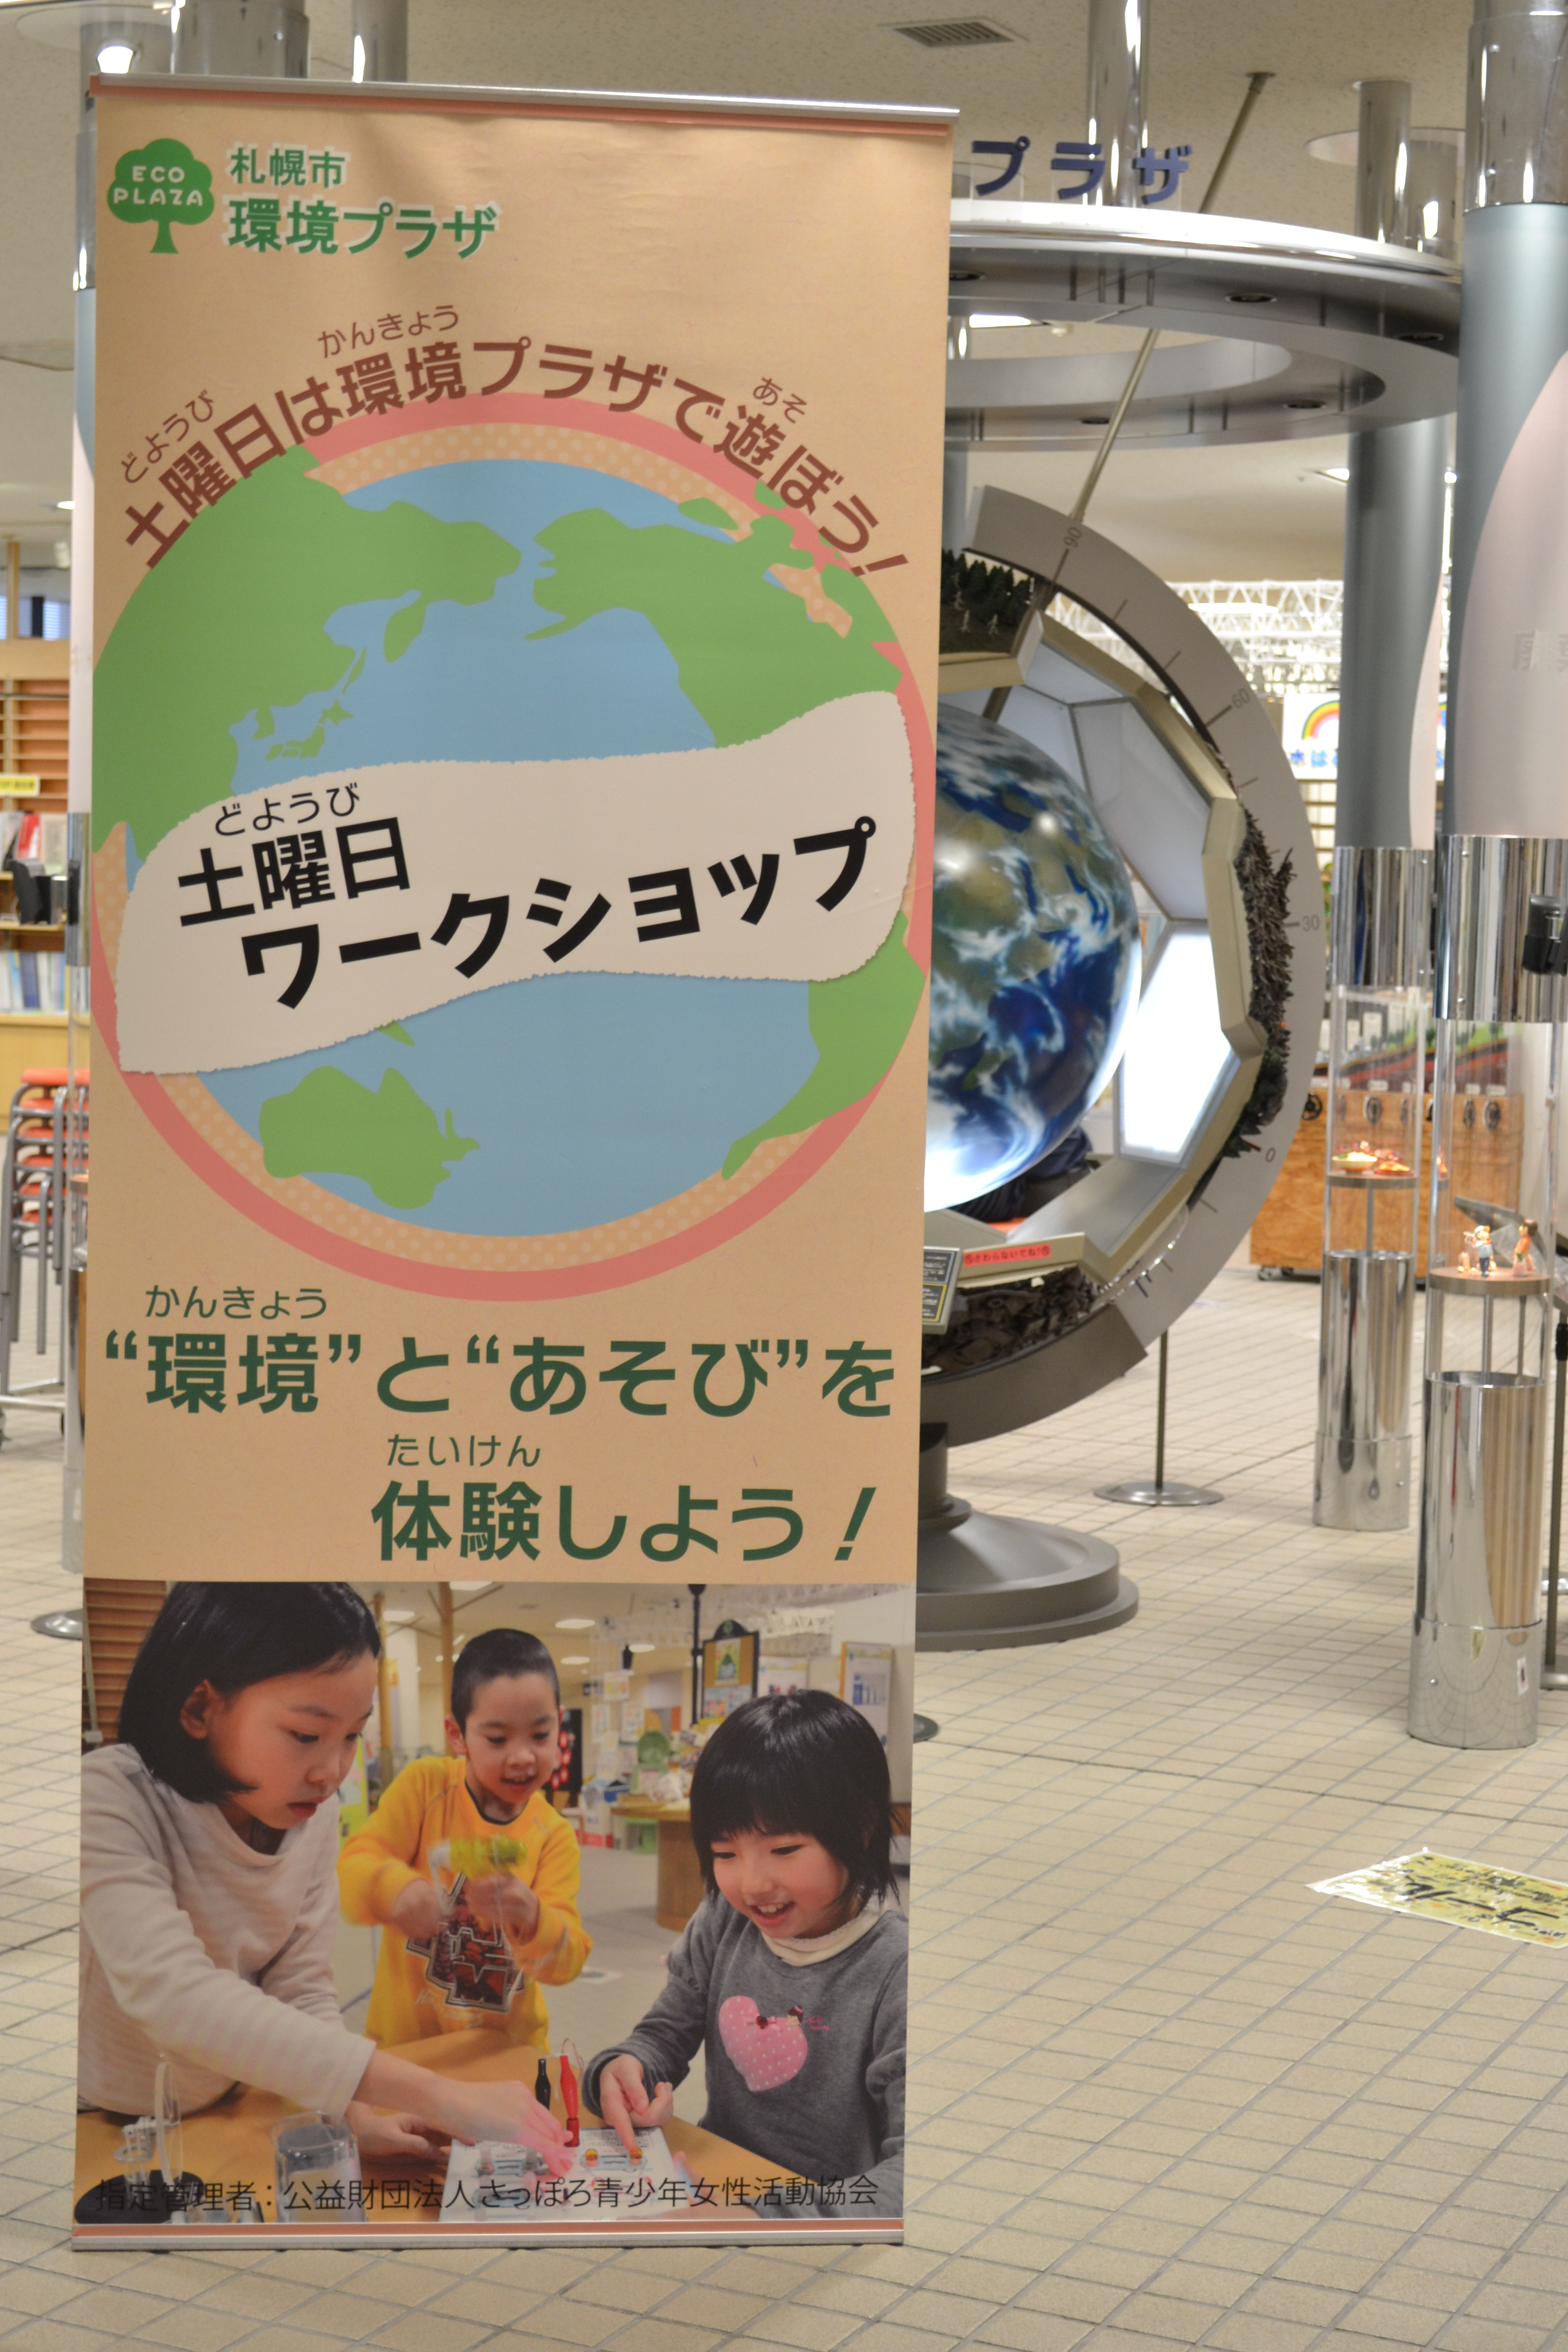 http://www.kankyo.sl-plaza.jp/blog/suma1.JPG